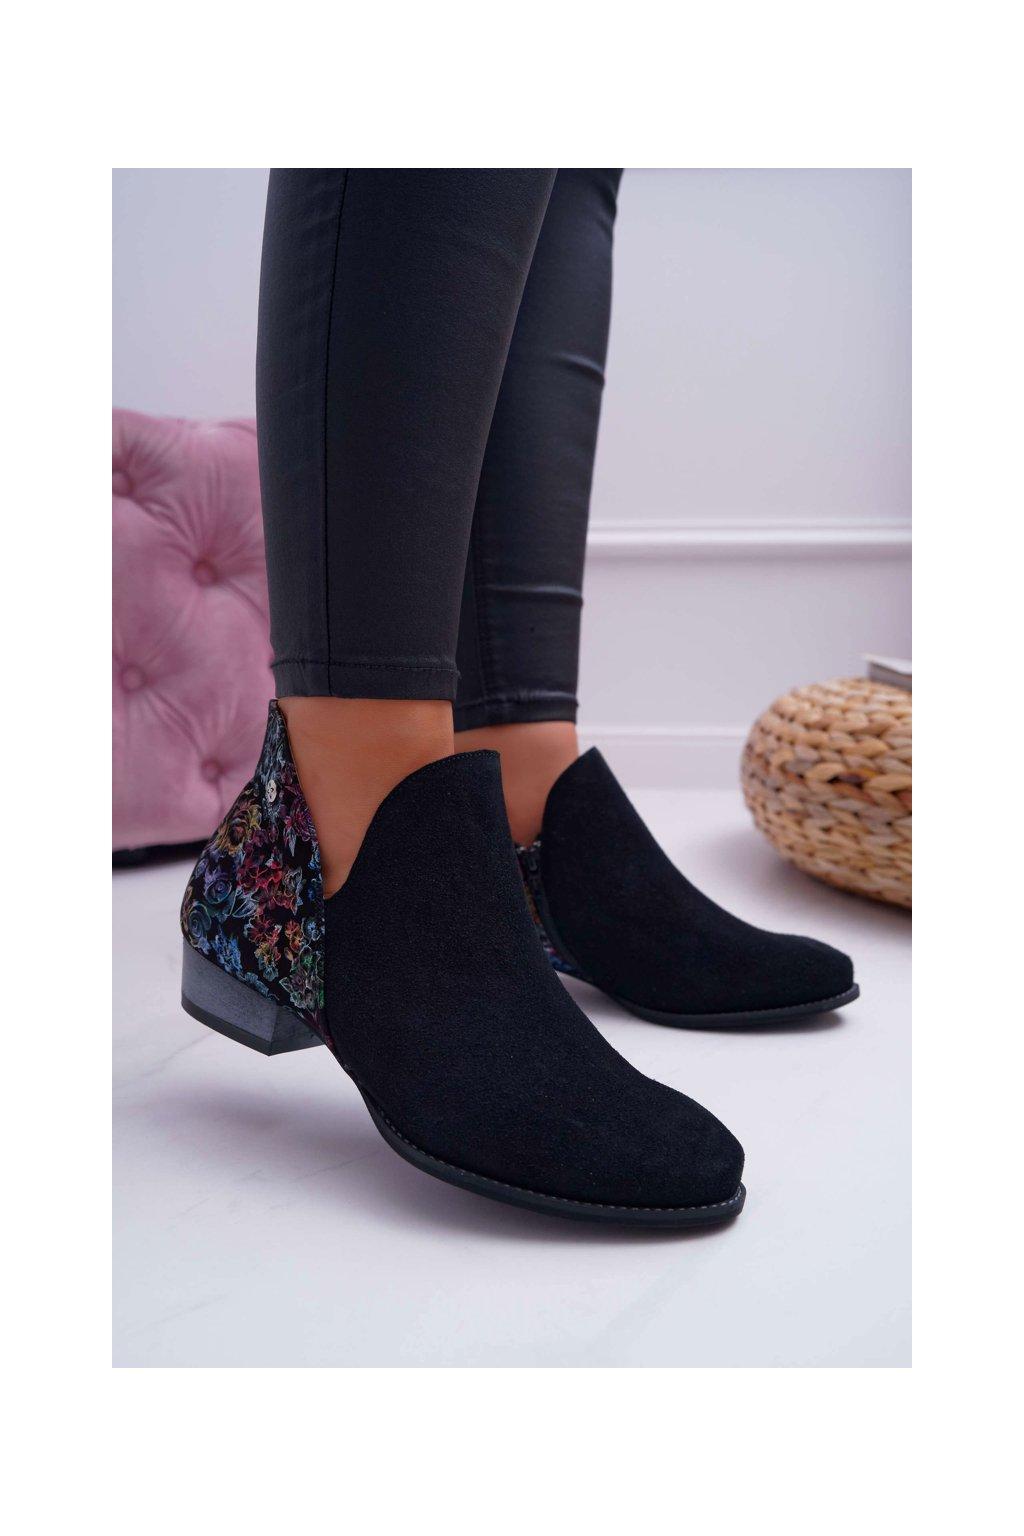 Členkové topánky na podpätku farba čierna NJSK 04091-57 BLK KWIATY